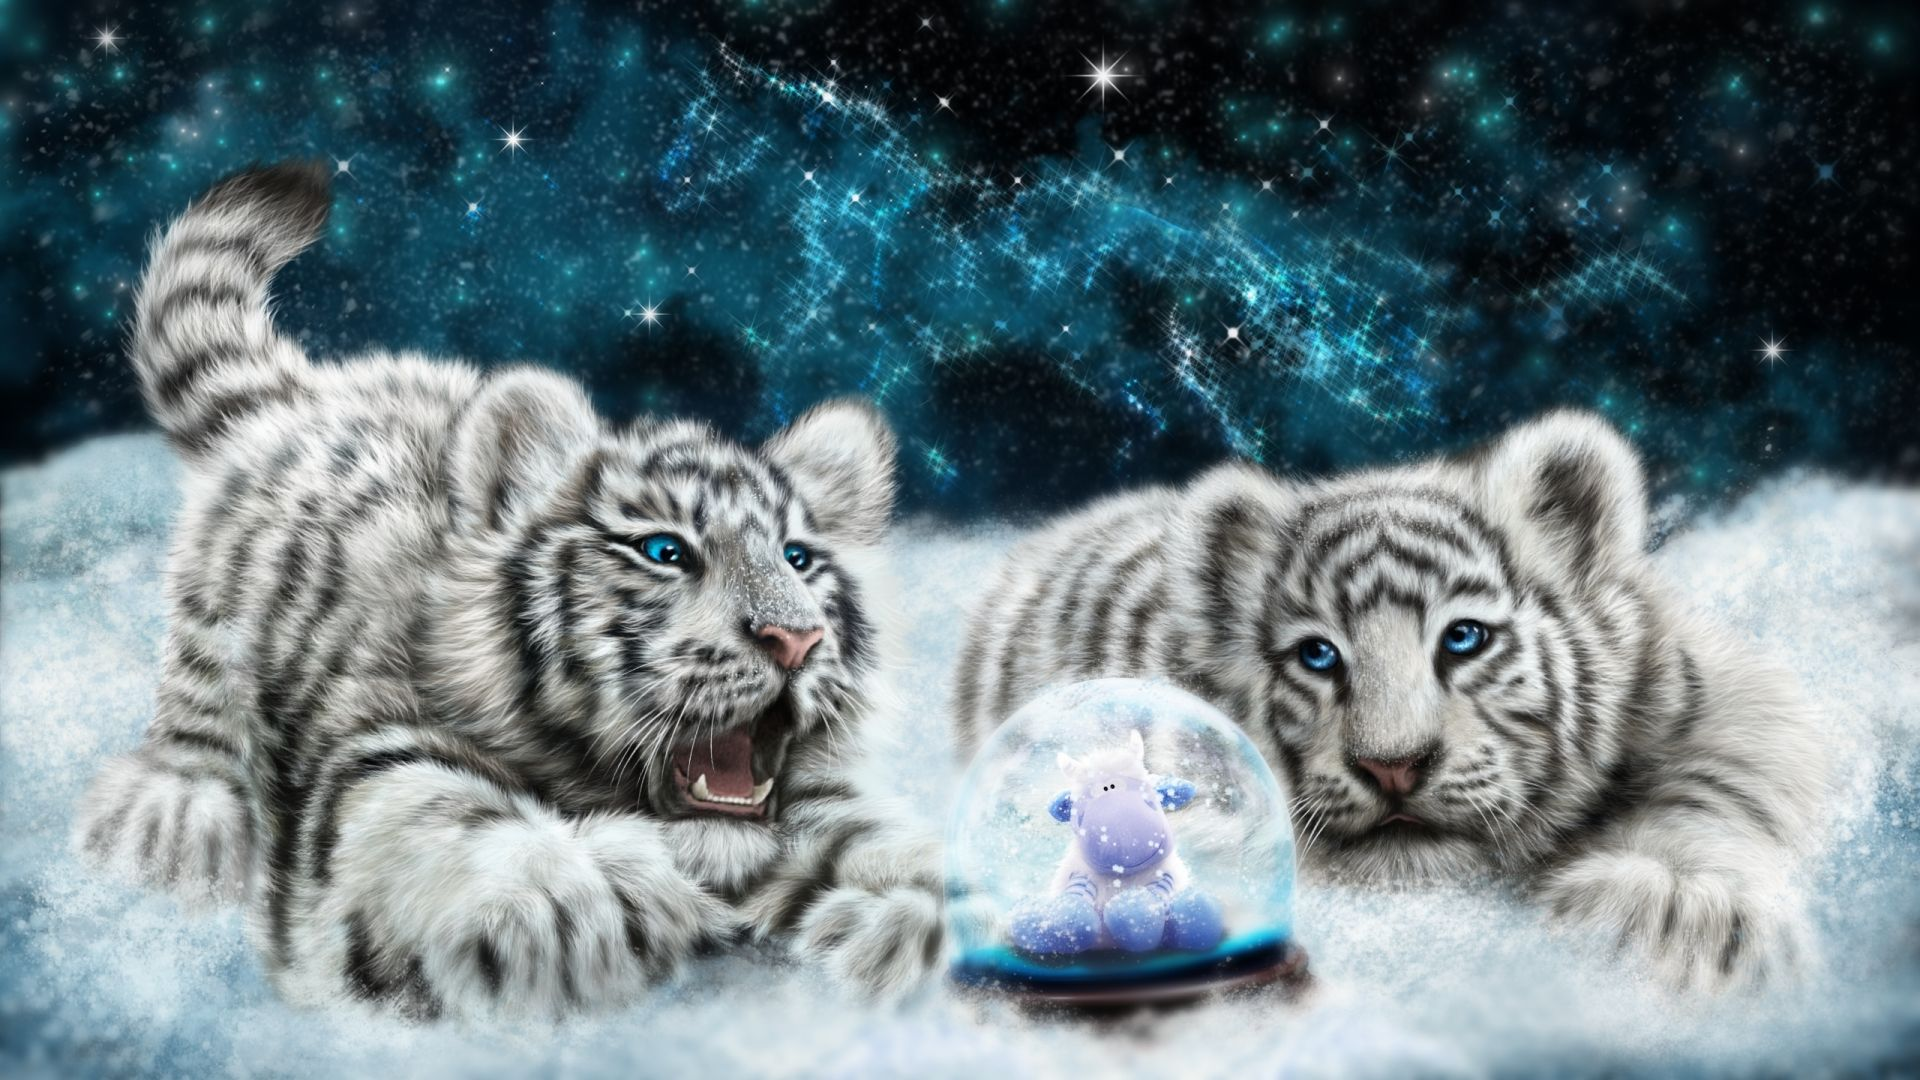 Tiger Baby art, Cool HD Wallpaper